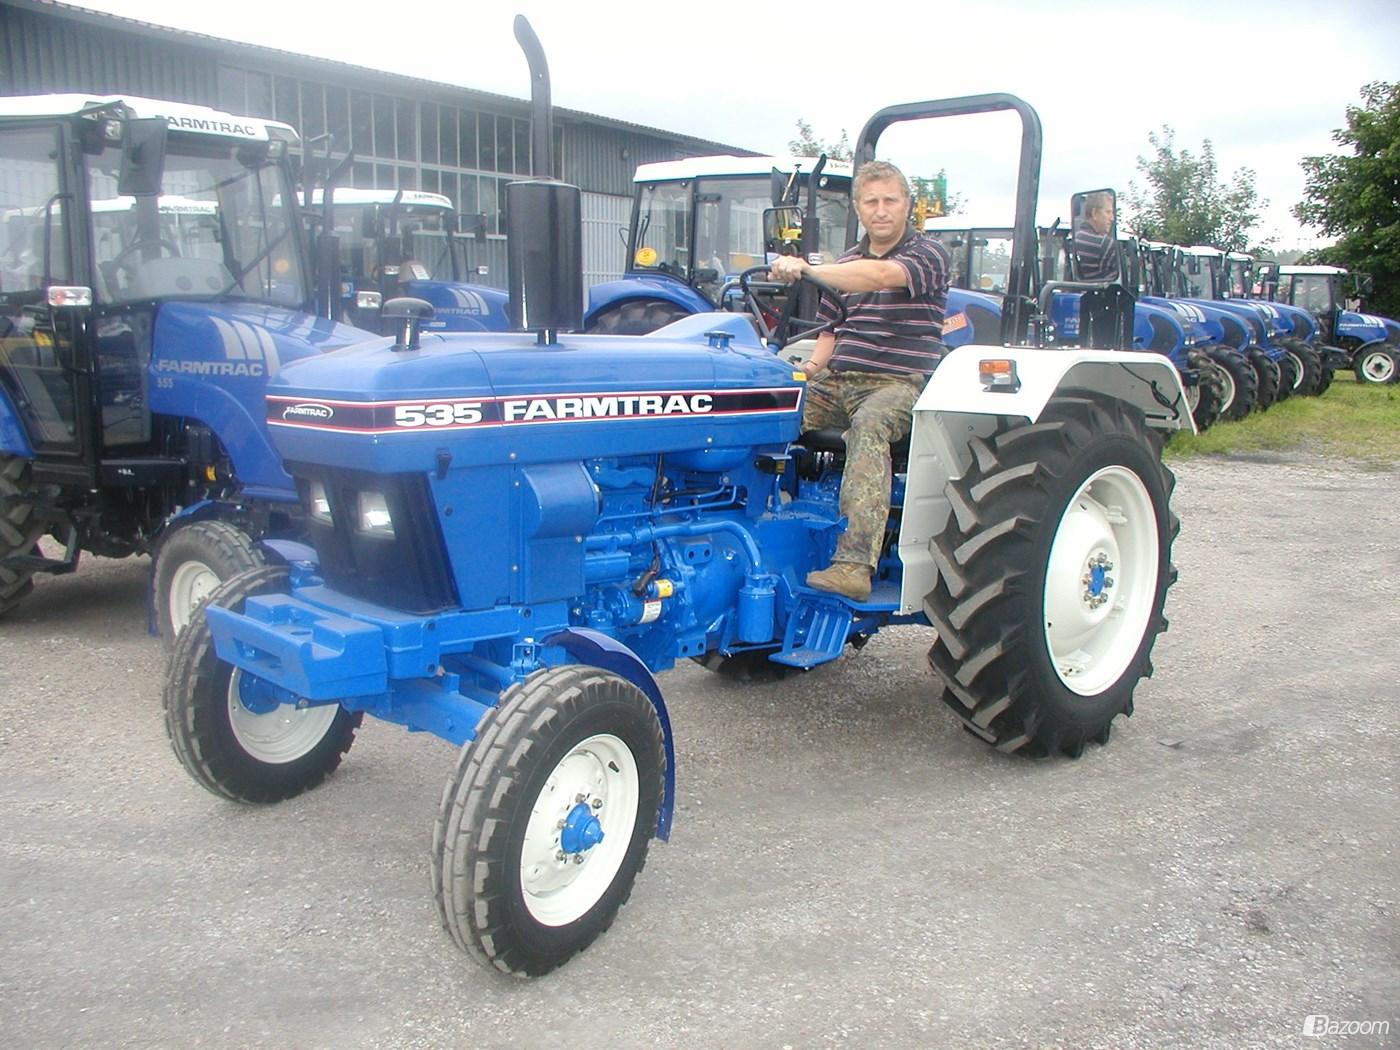 hight resolution of farmtrac farm tractors farm tractors farm tractors tractorhd mobi cushman wiring diagrams ignition wiring diagram farmtrac